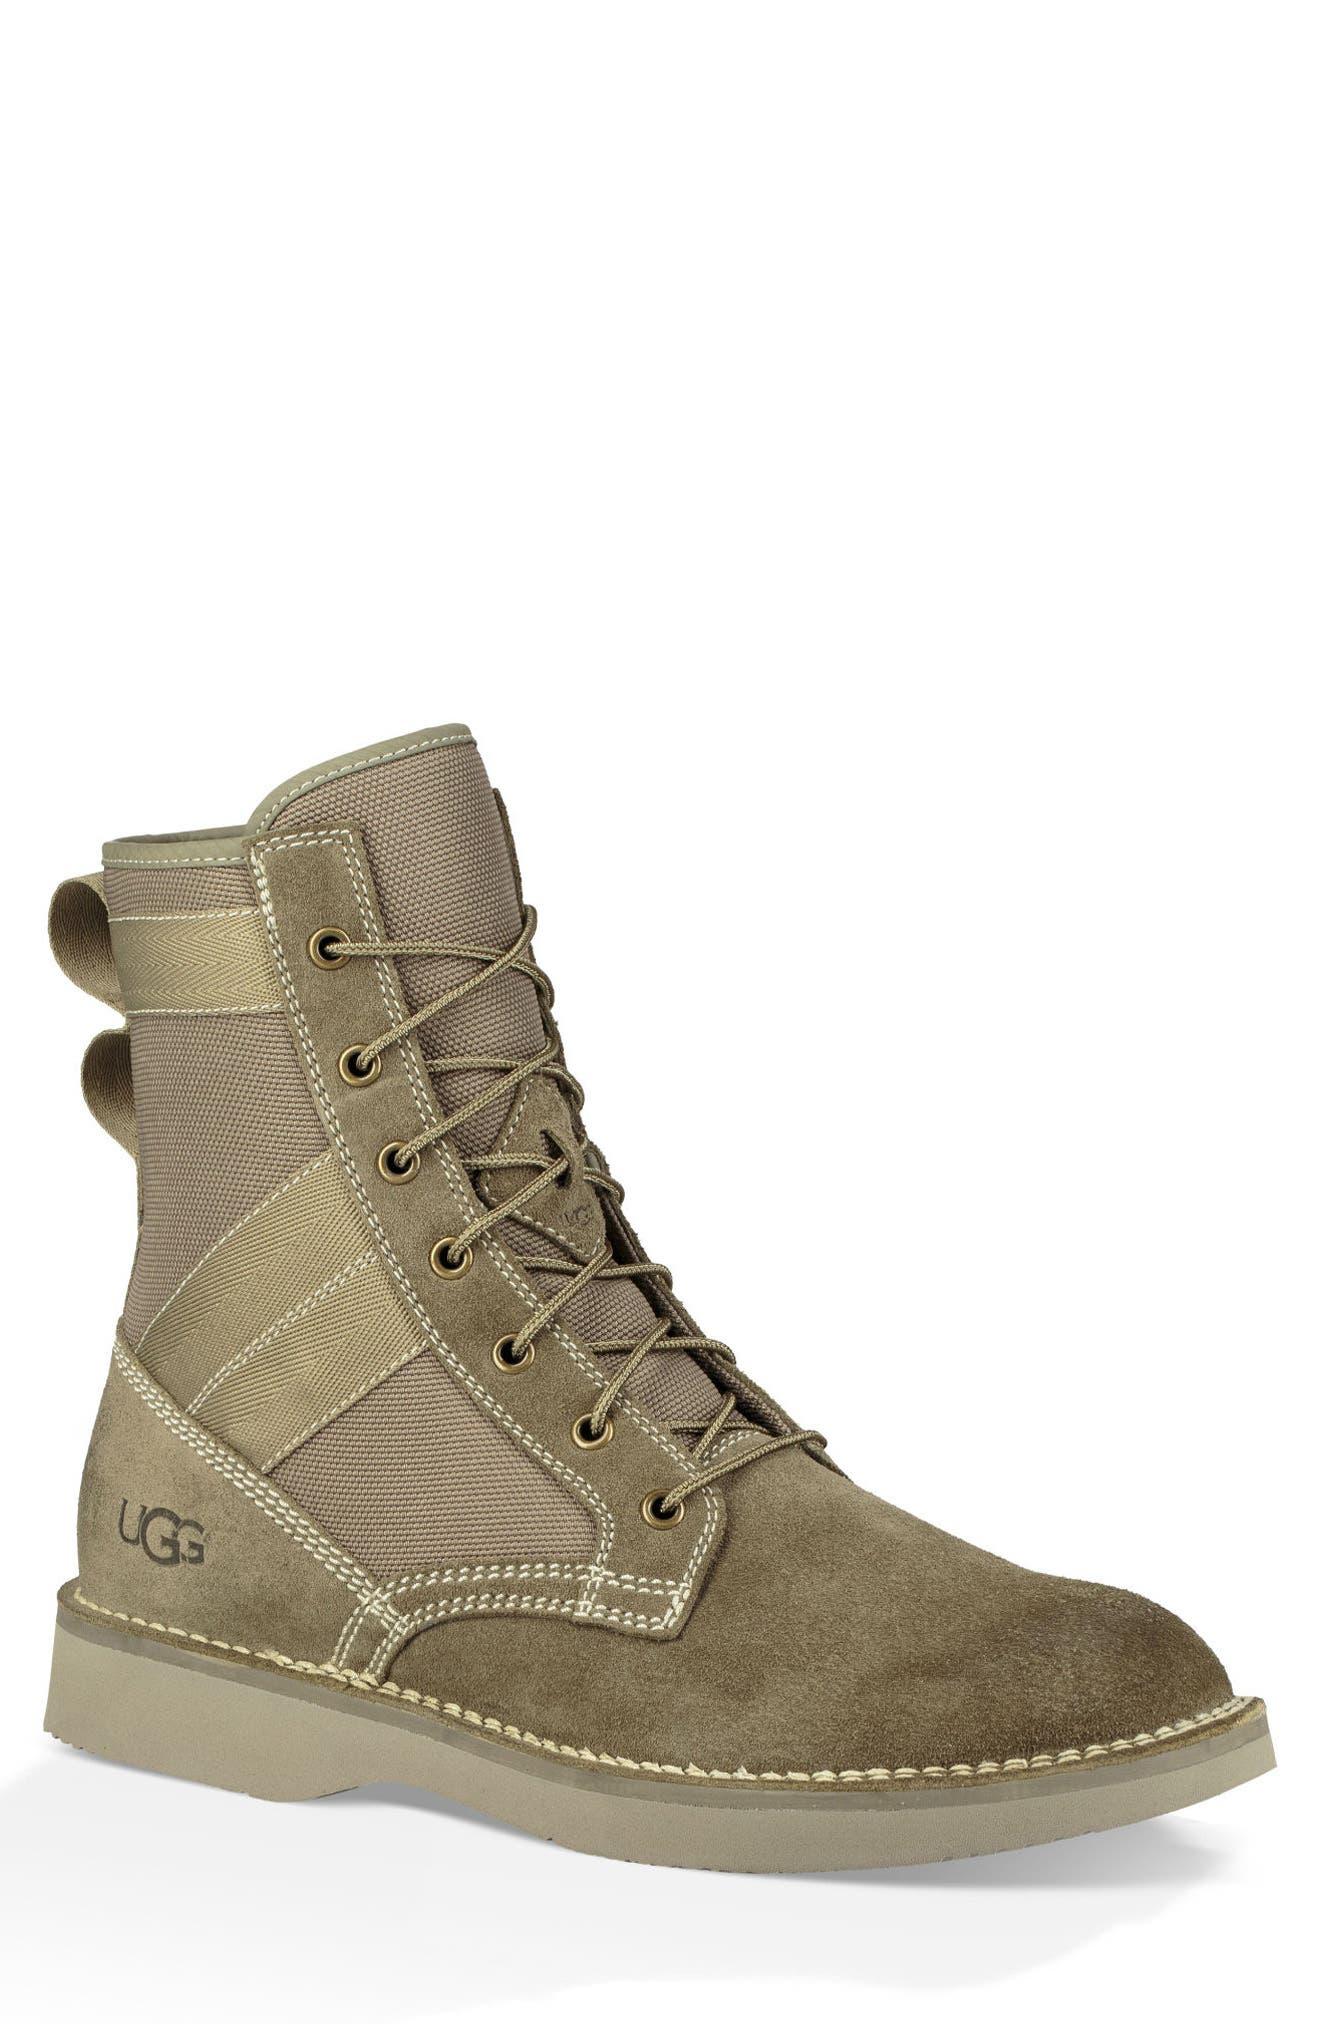 Ugg Camino Plain Toe Boot